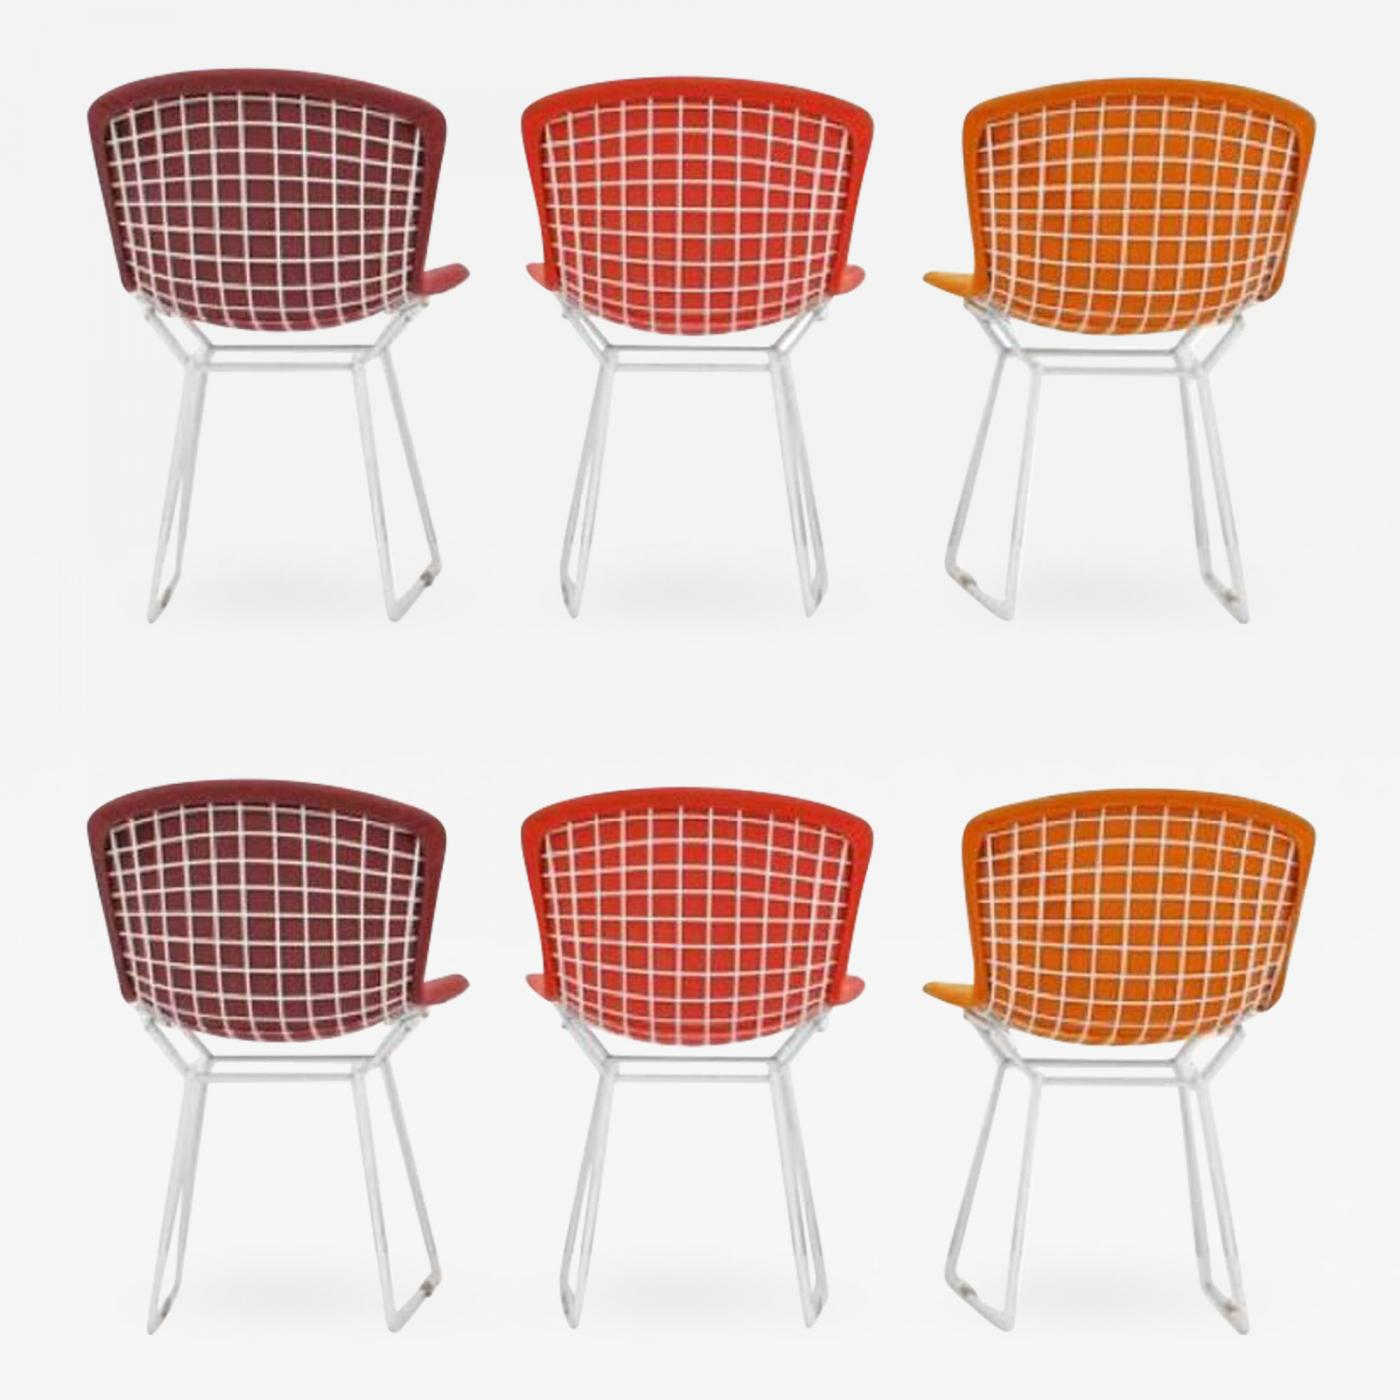 Bertoia Wire Chair | Harry Bertoia Harry Bertoia Wire Chairs For Knoll International Early